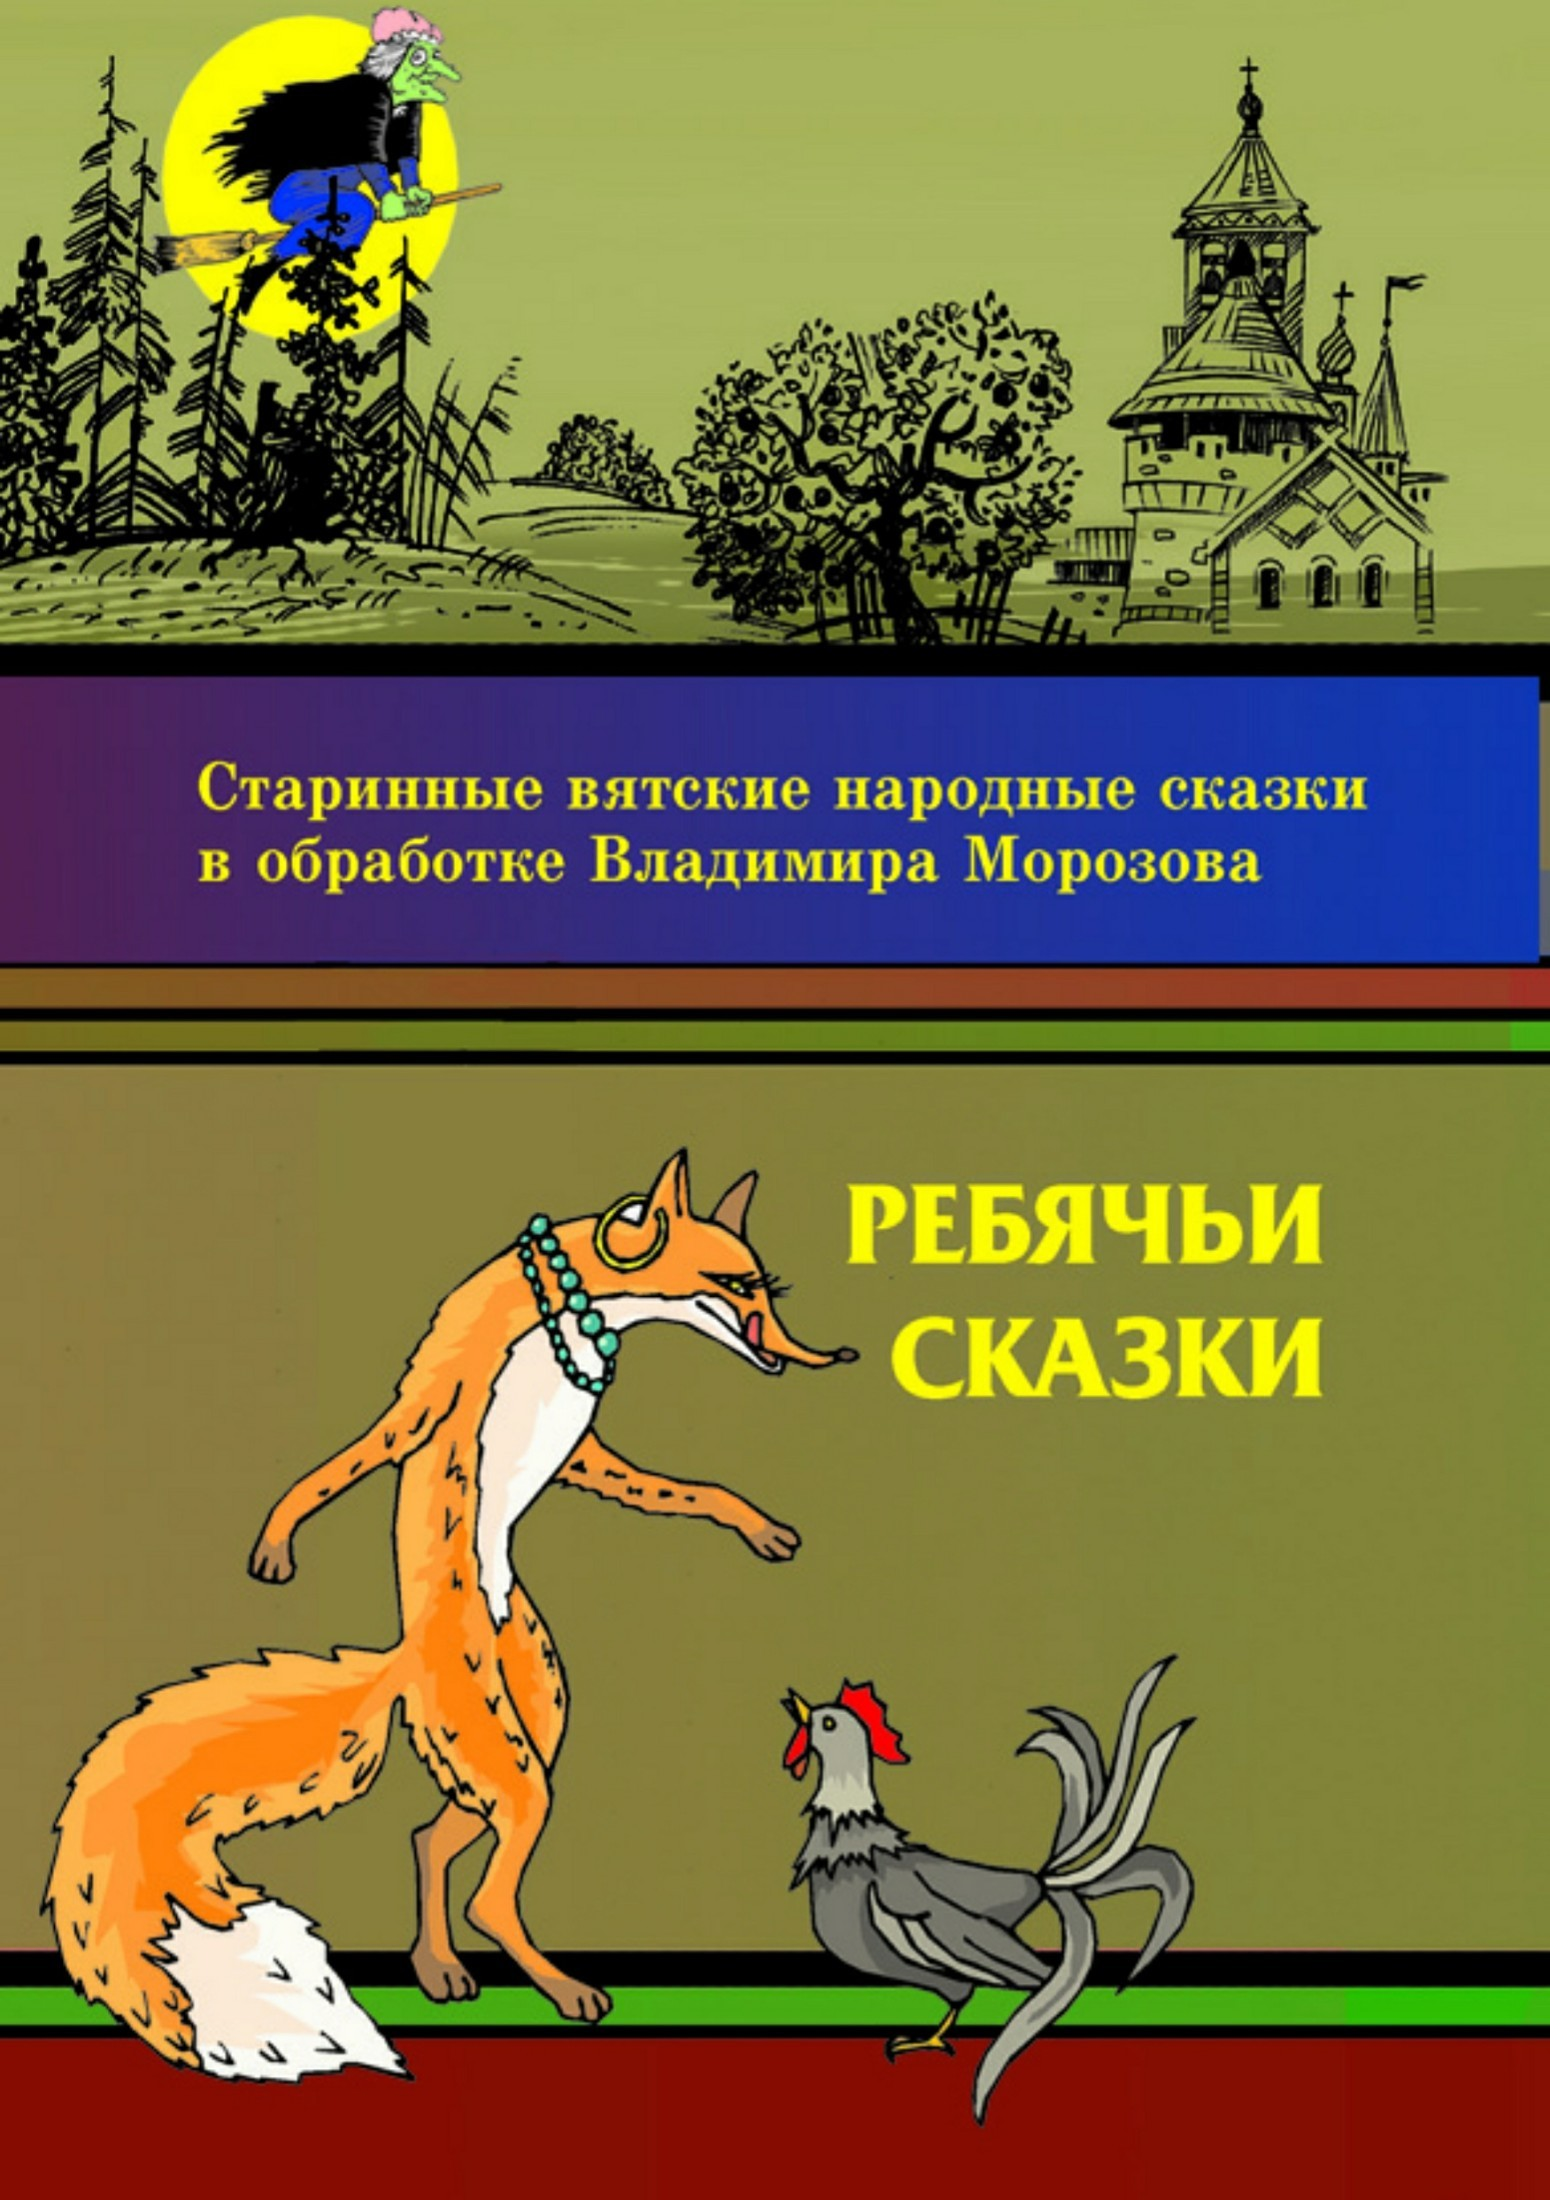 Владимир Морозов - Ребячьи сказки